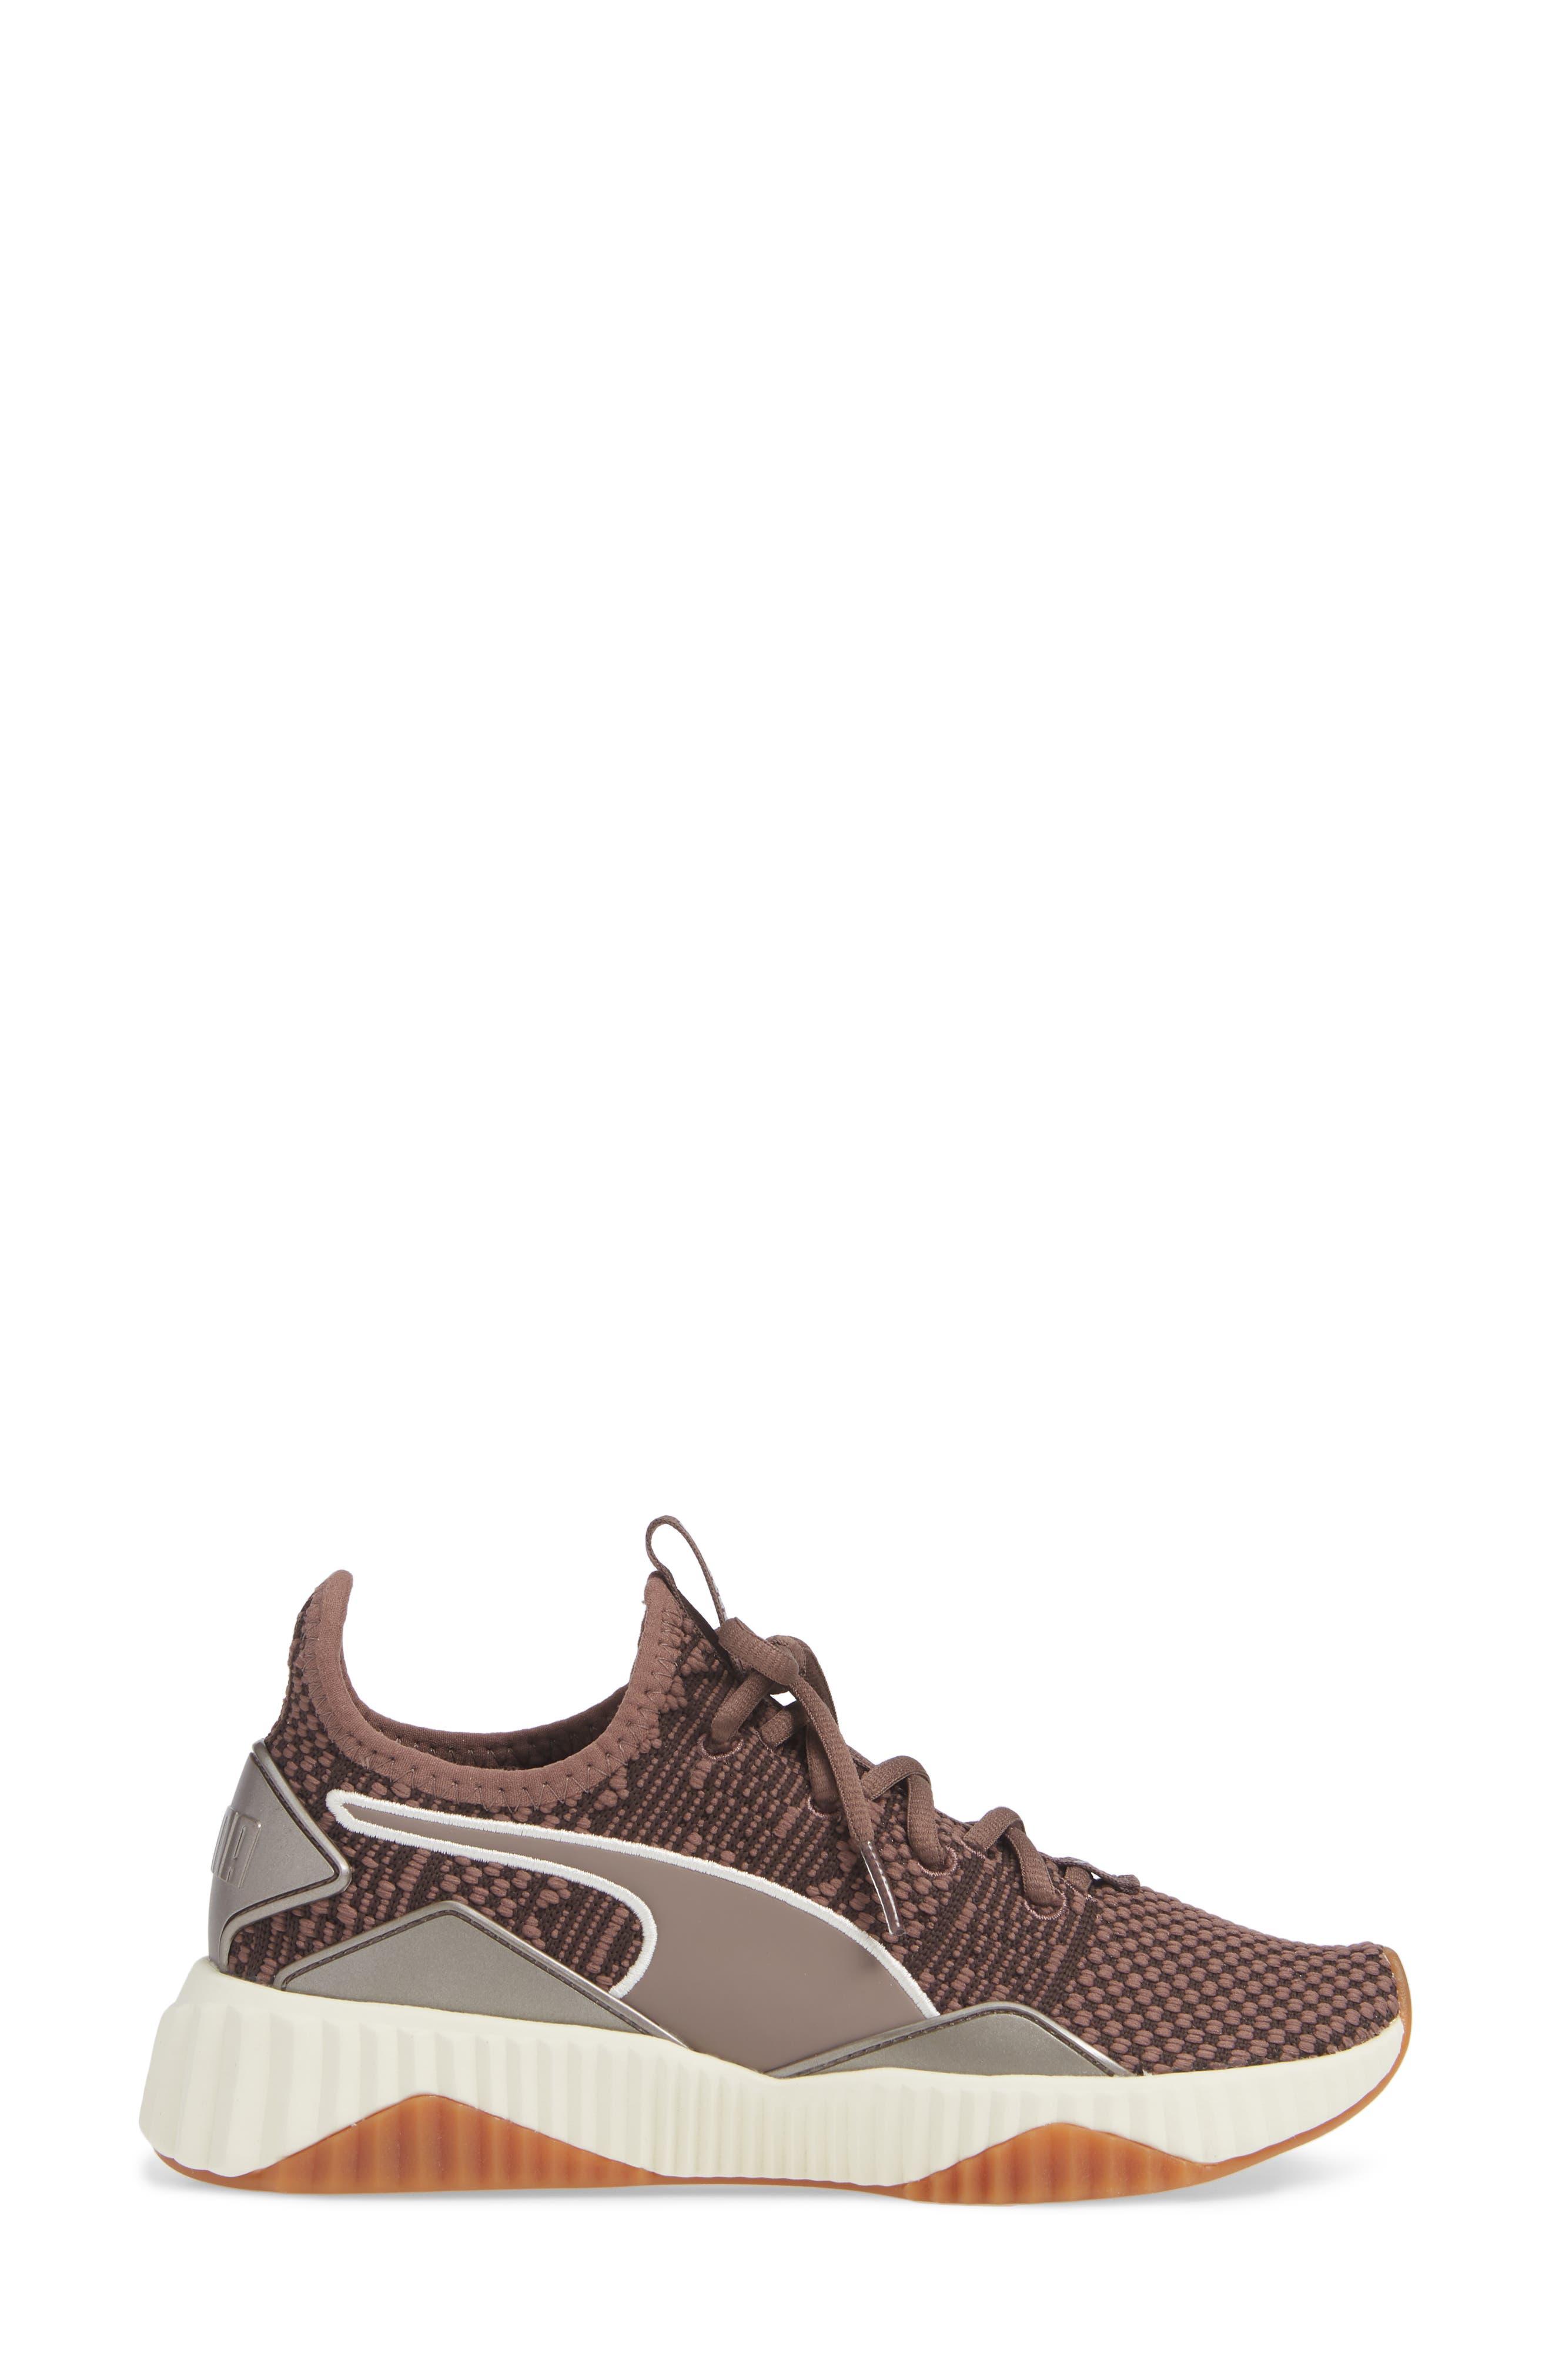 PUMA, Defy Luxe Sneaker, Alternate thumbnail 3, color, PEPPERCORN/ METALLIC ASH